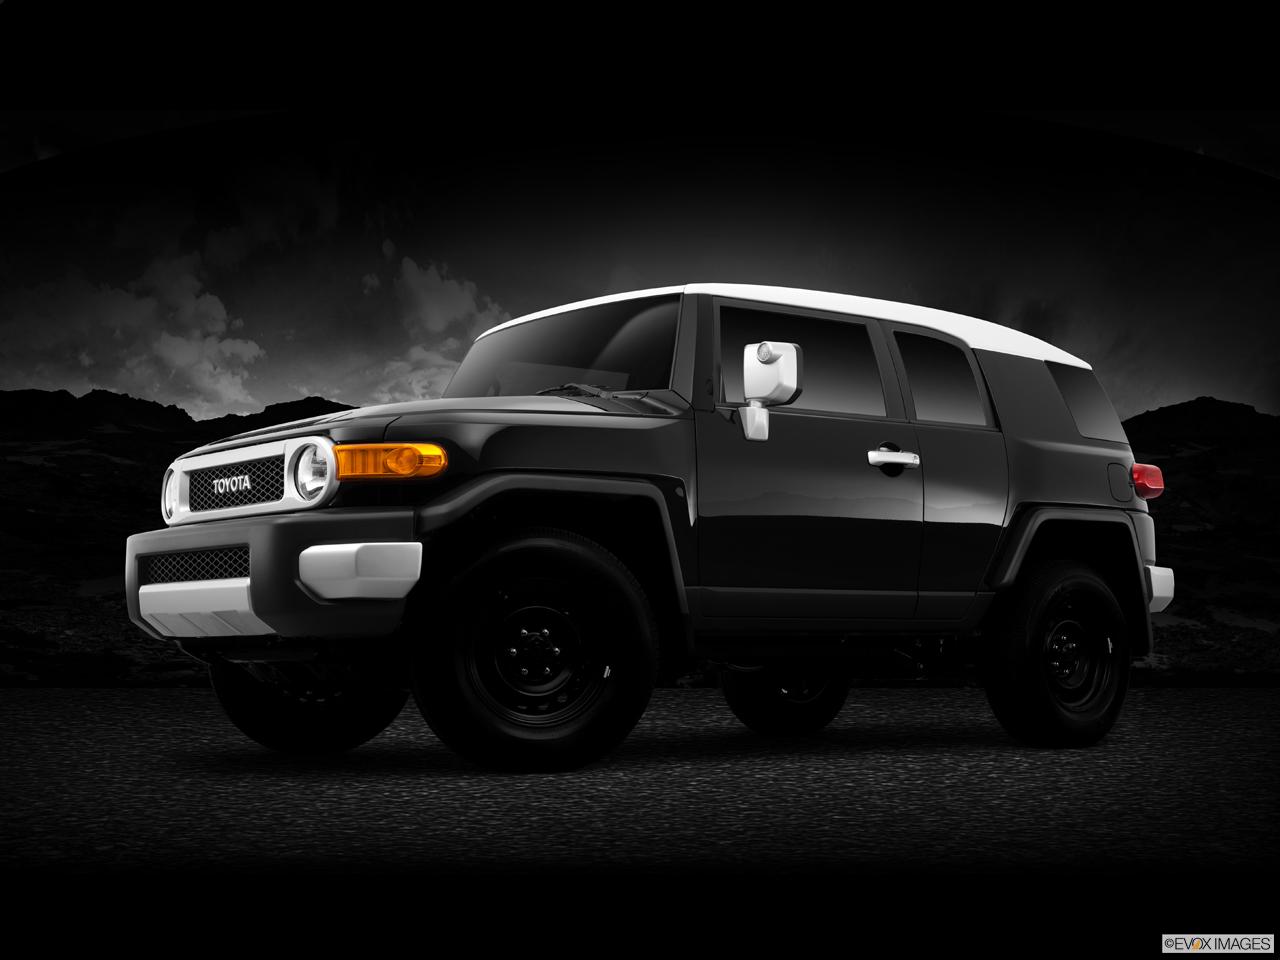 toyota fj cruiser rocker panel guard advance auto parts. Black Bedroom Furniture Sets. Home Design Ideas